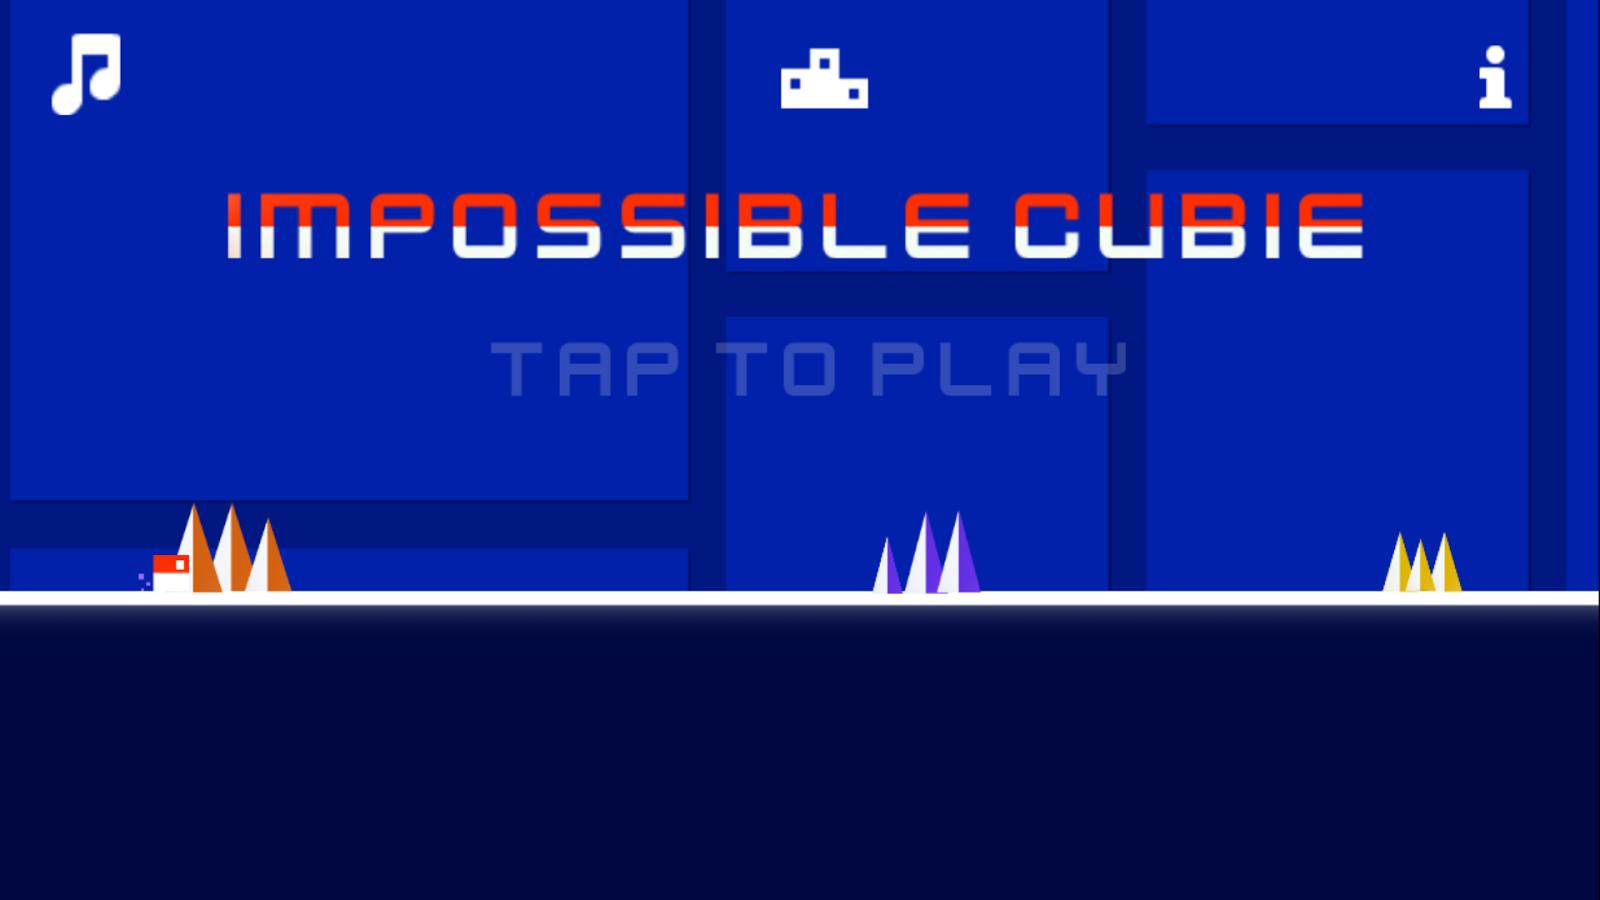 Impossible-Cubie 25